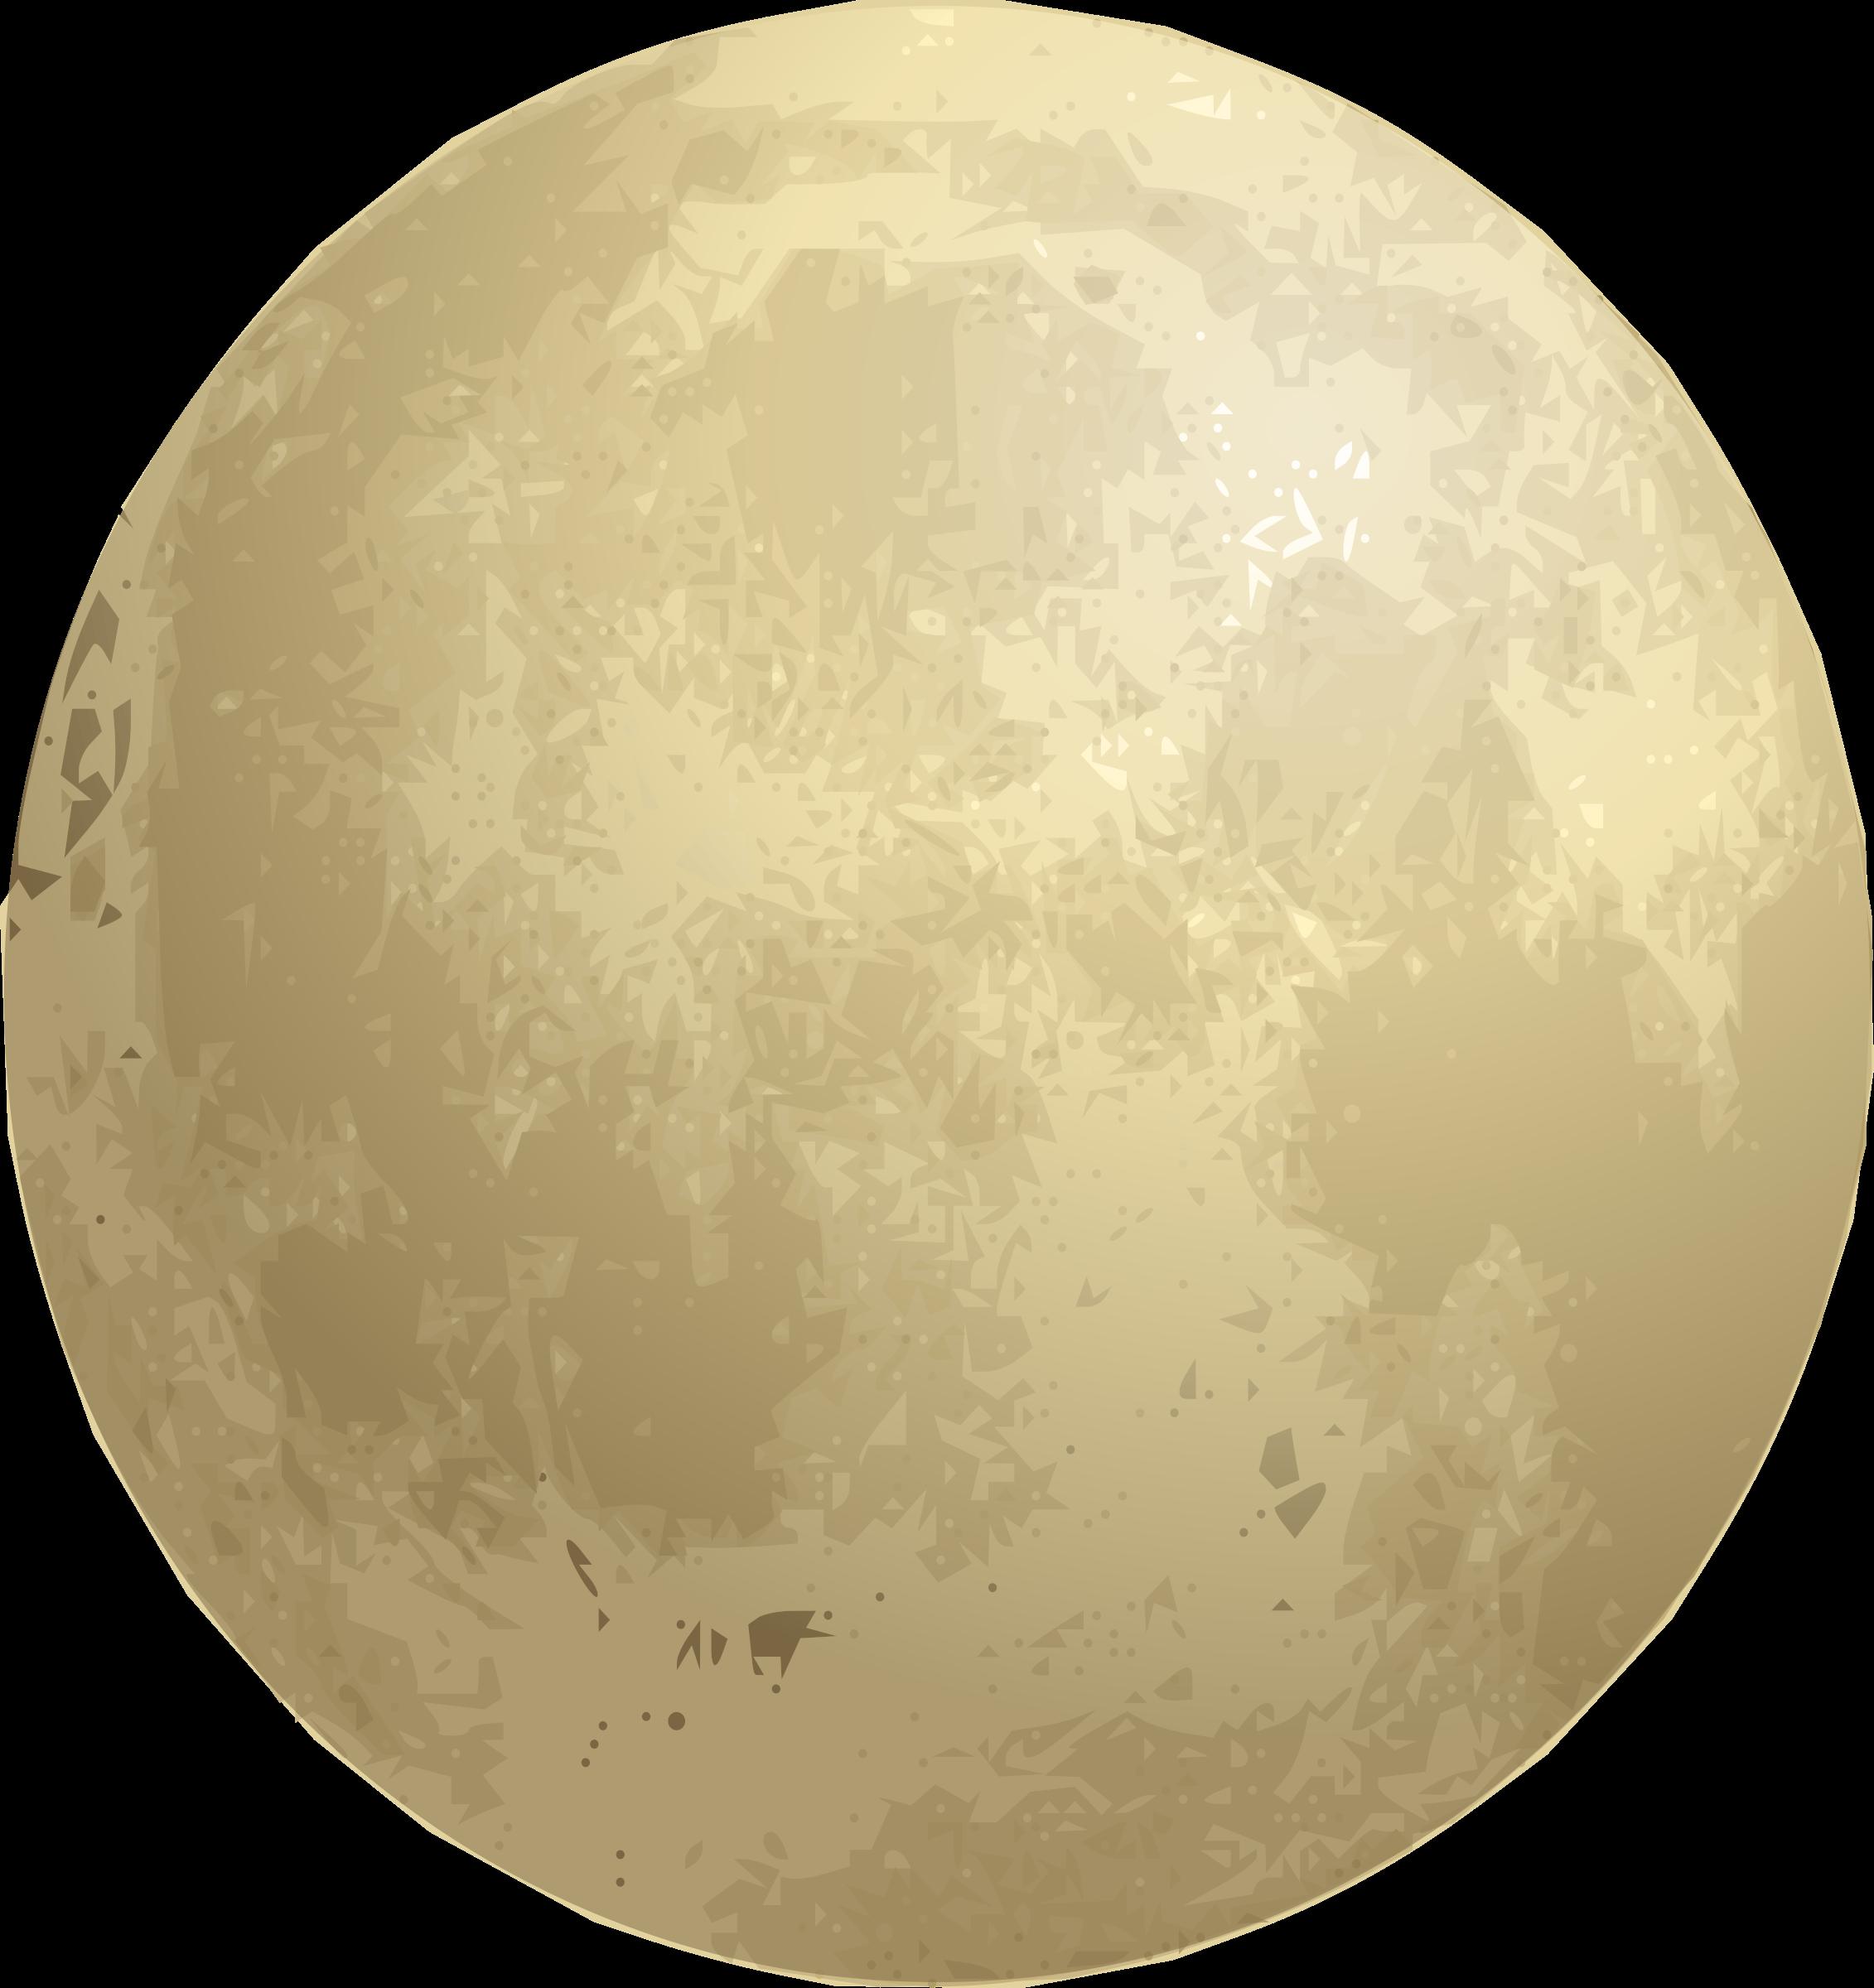 Planets clipart space stuff. Luna big image png